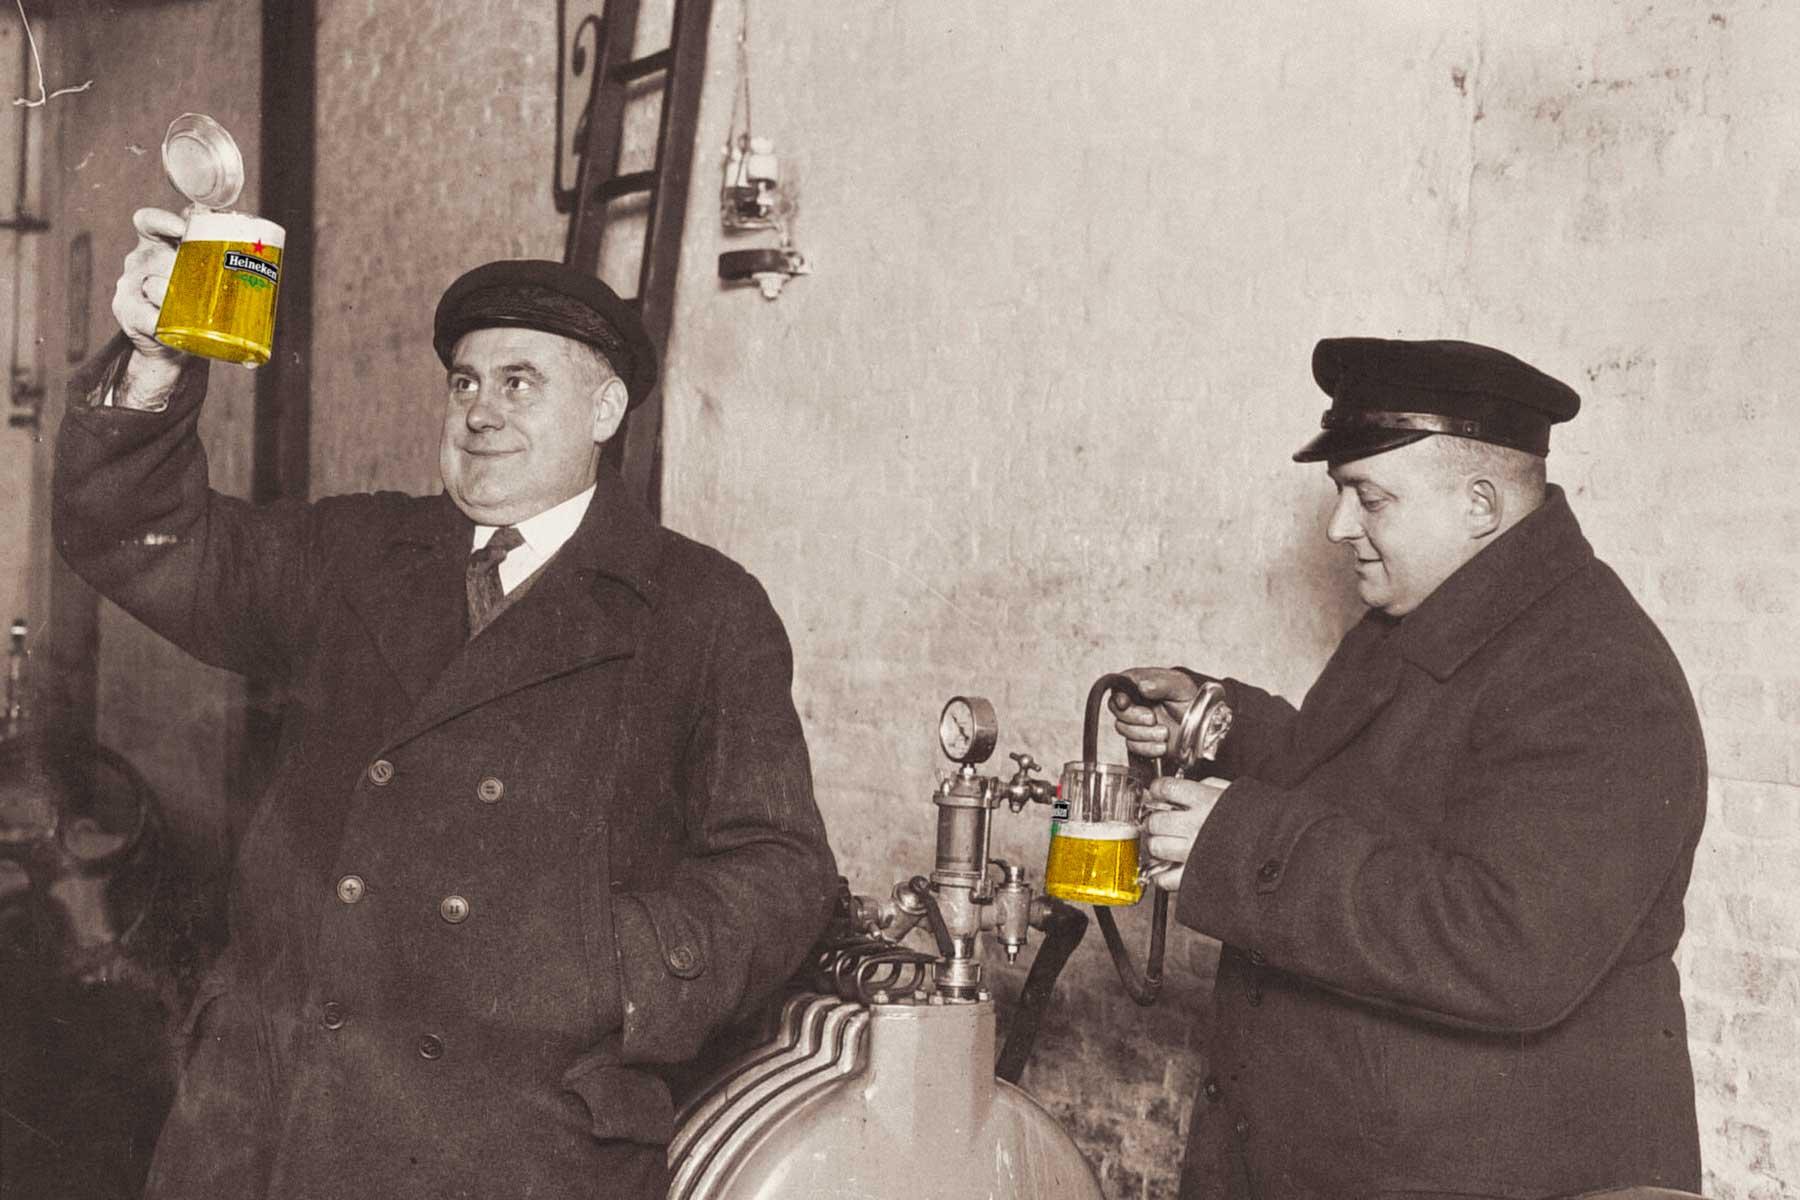 Bier, Irene, Hoogkarspel, dtp